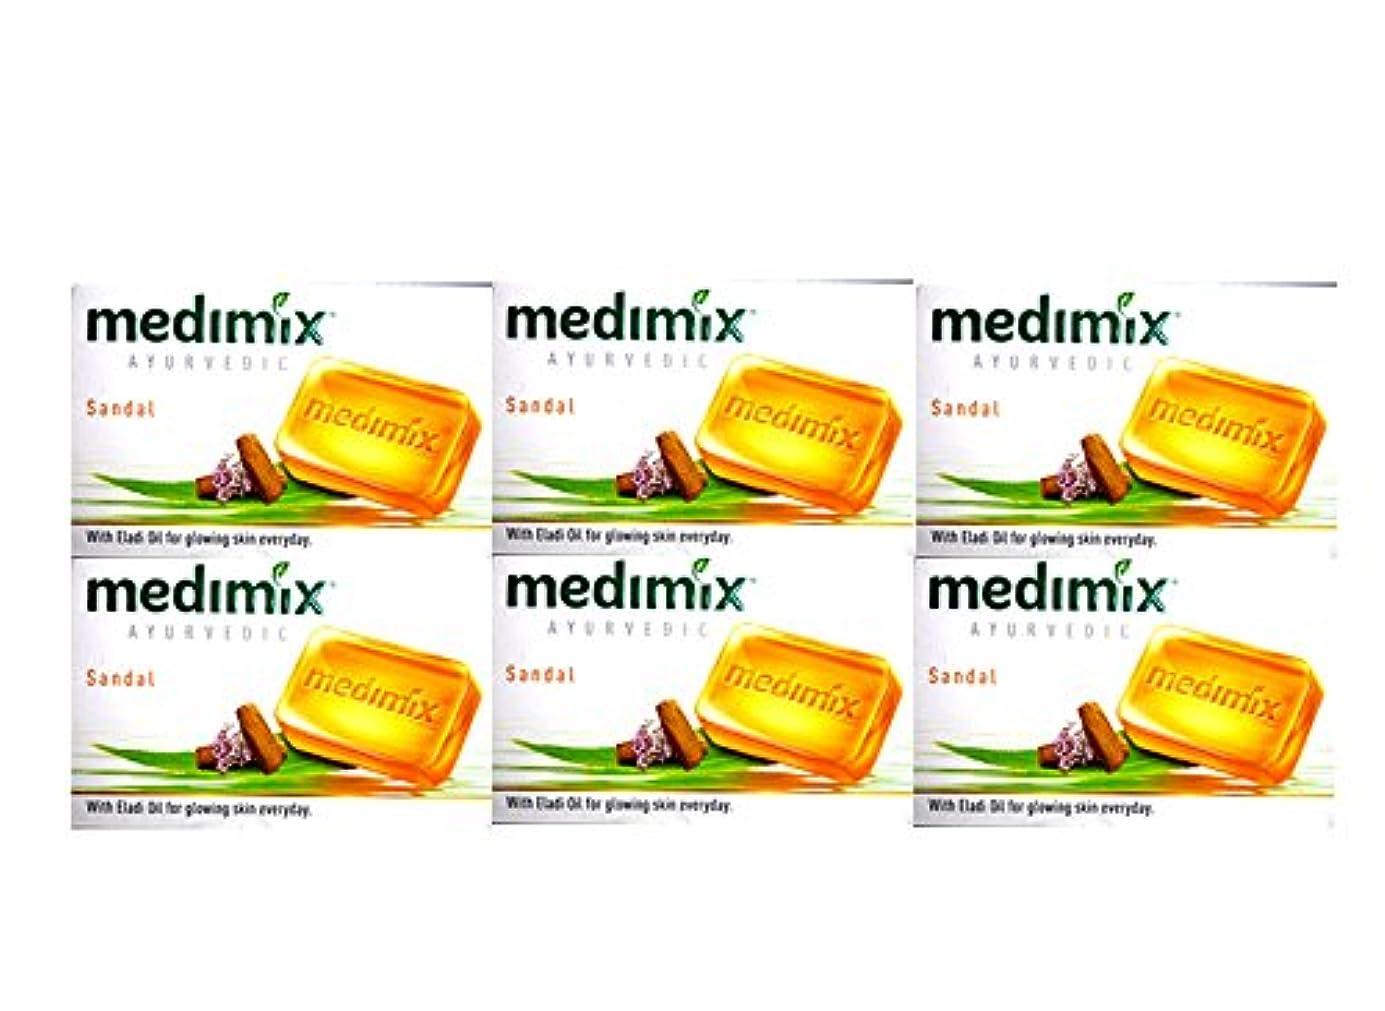 MEDIMIX メディミックス アーユルヴェディックサンダル 6個セット(medimix AYURVEDEC sandal Soap) 125g